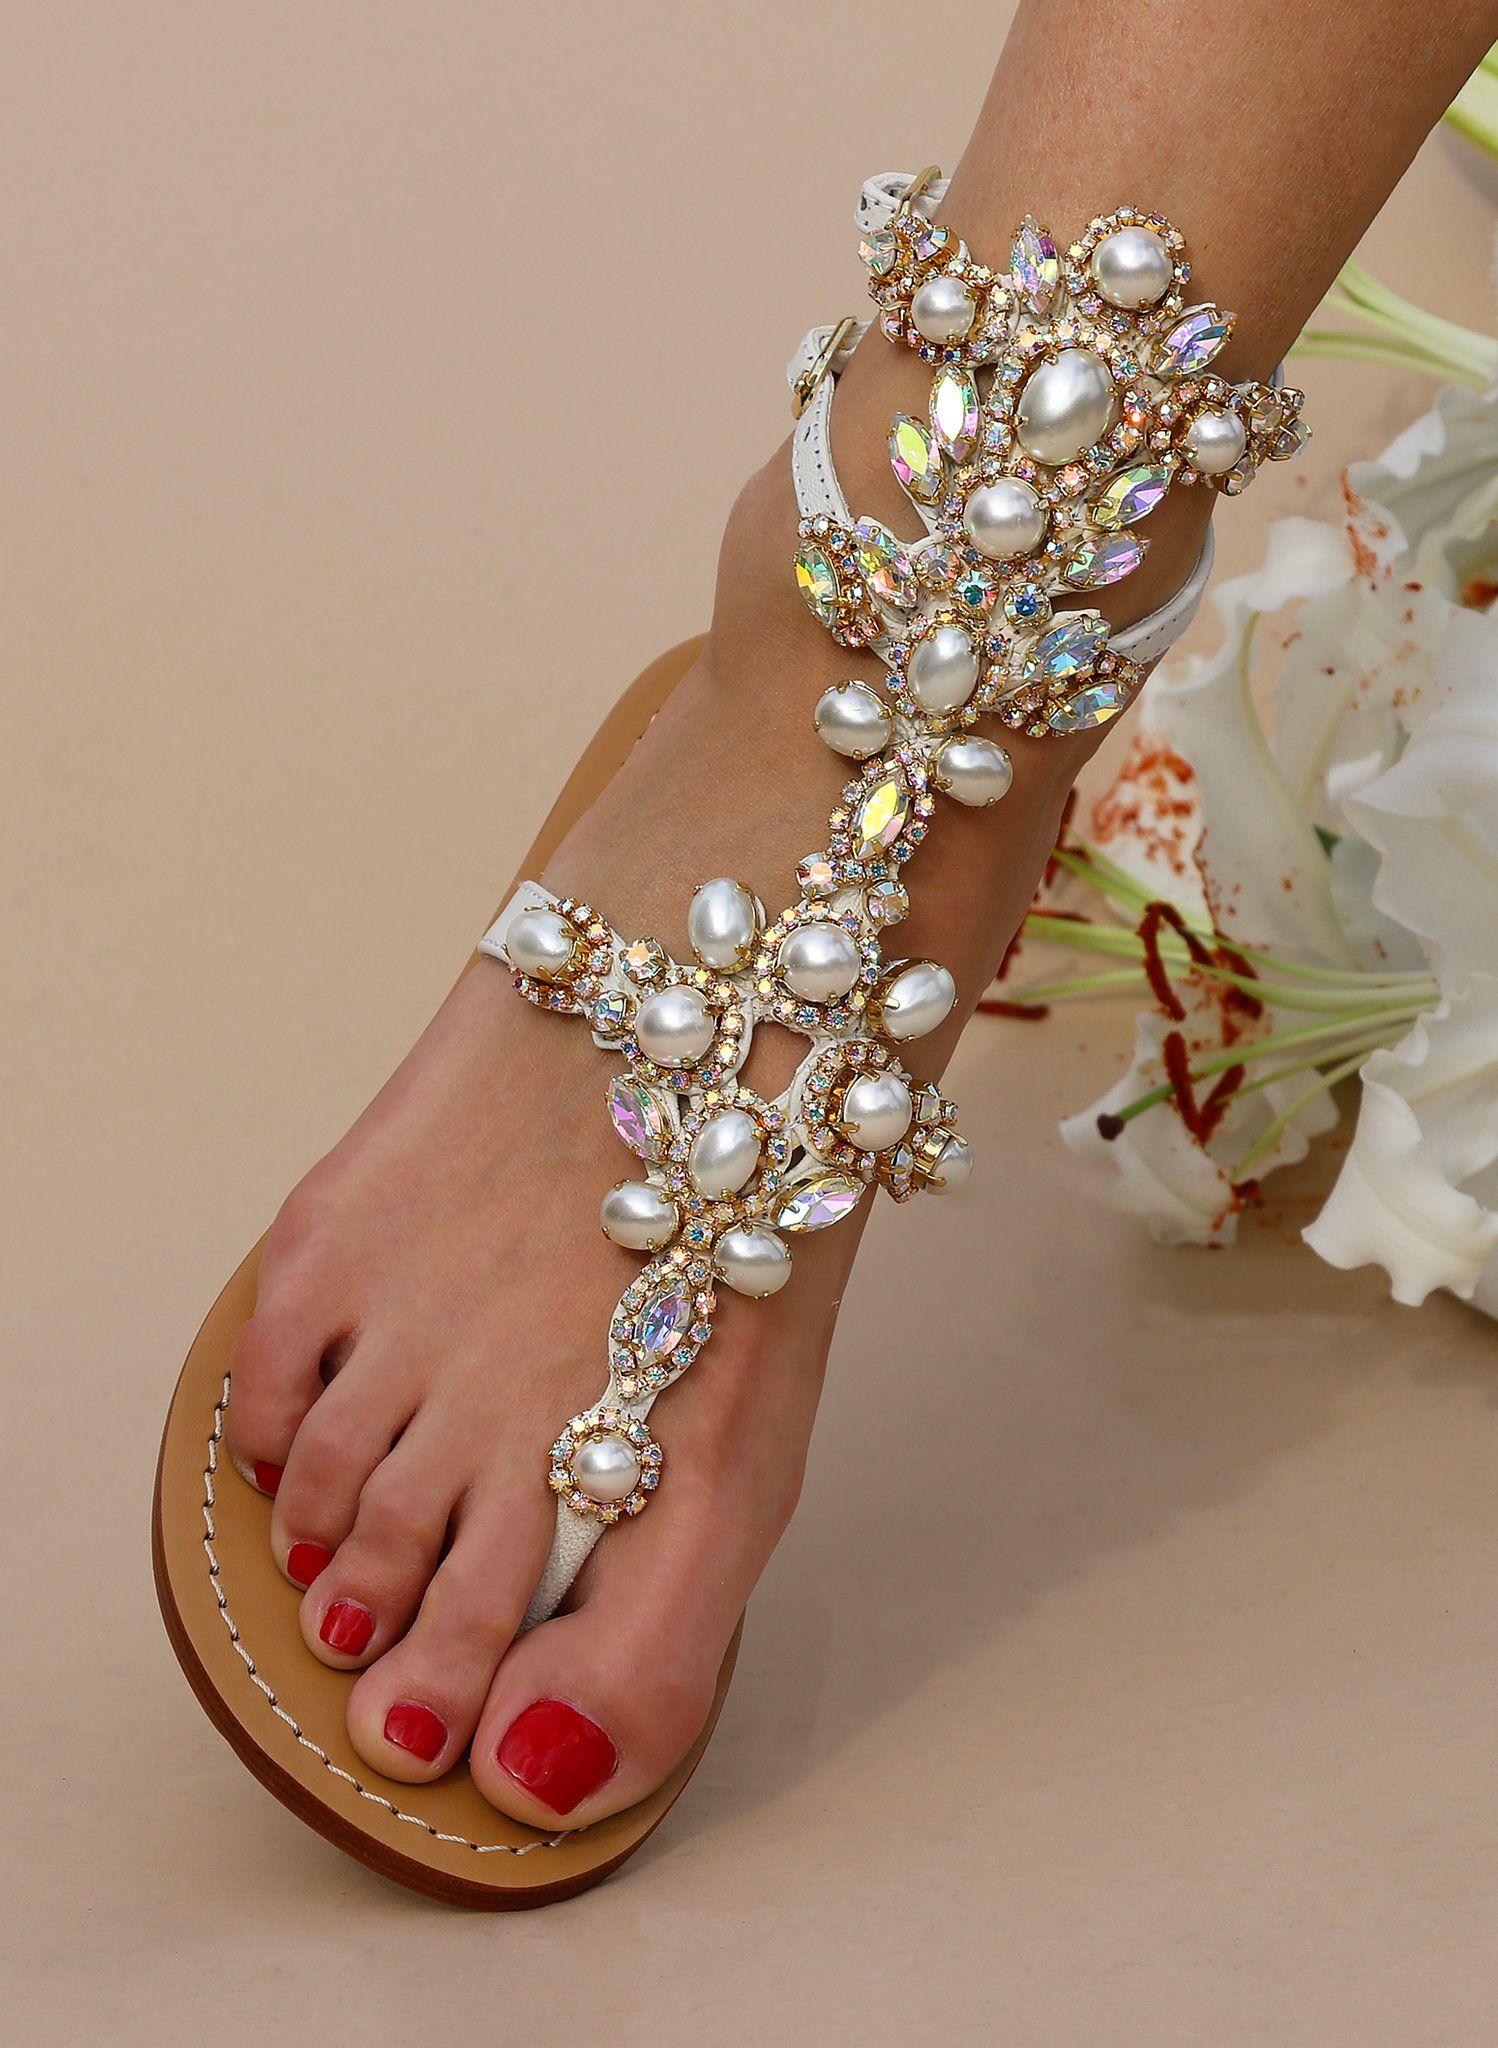 b2a3f6799e4a Aurora - Women s White Pearl Gladiator Sandals